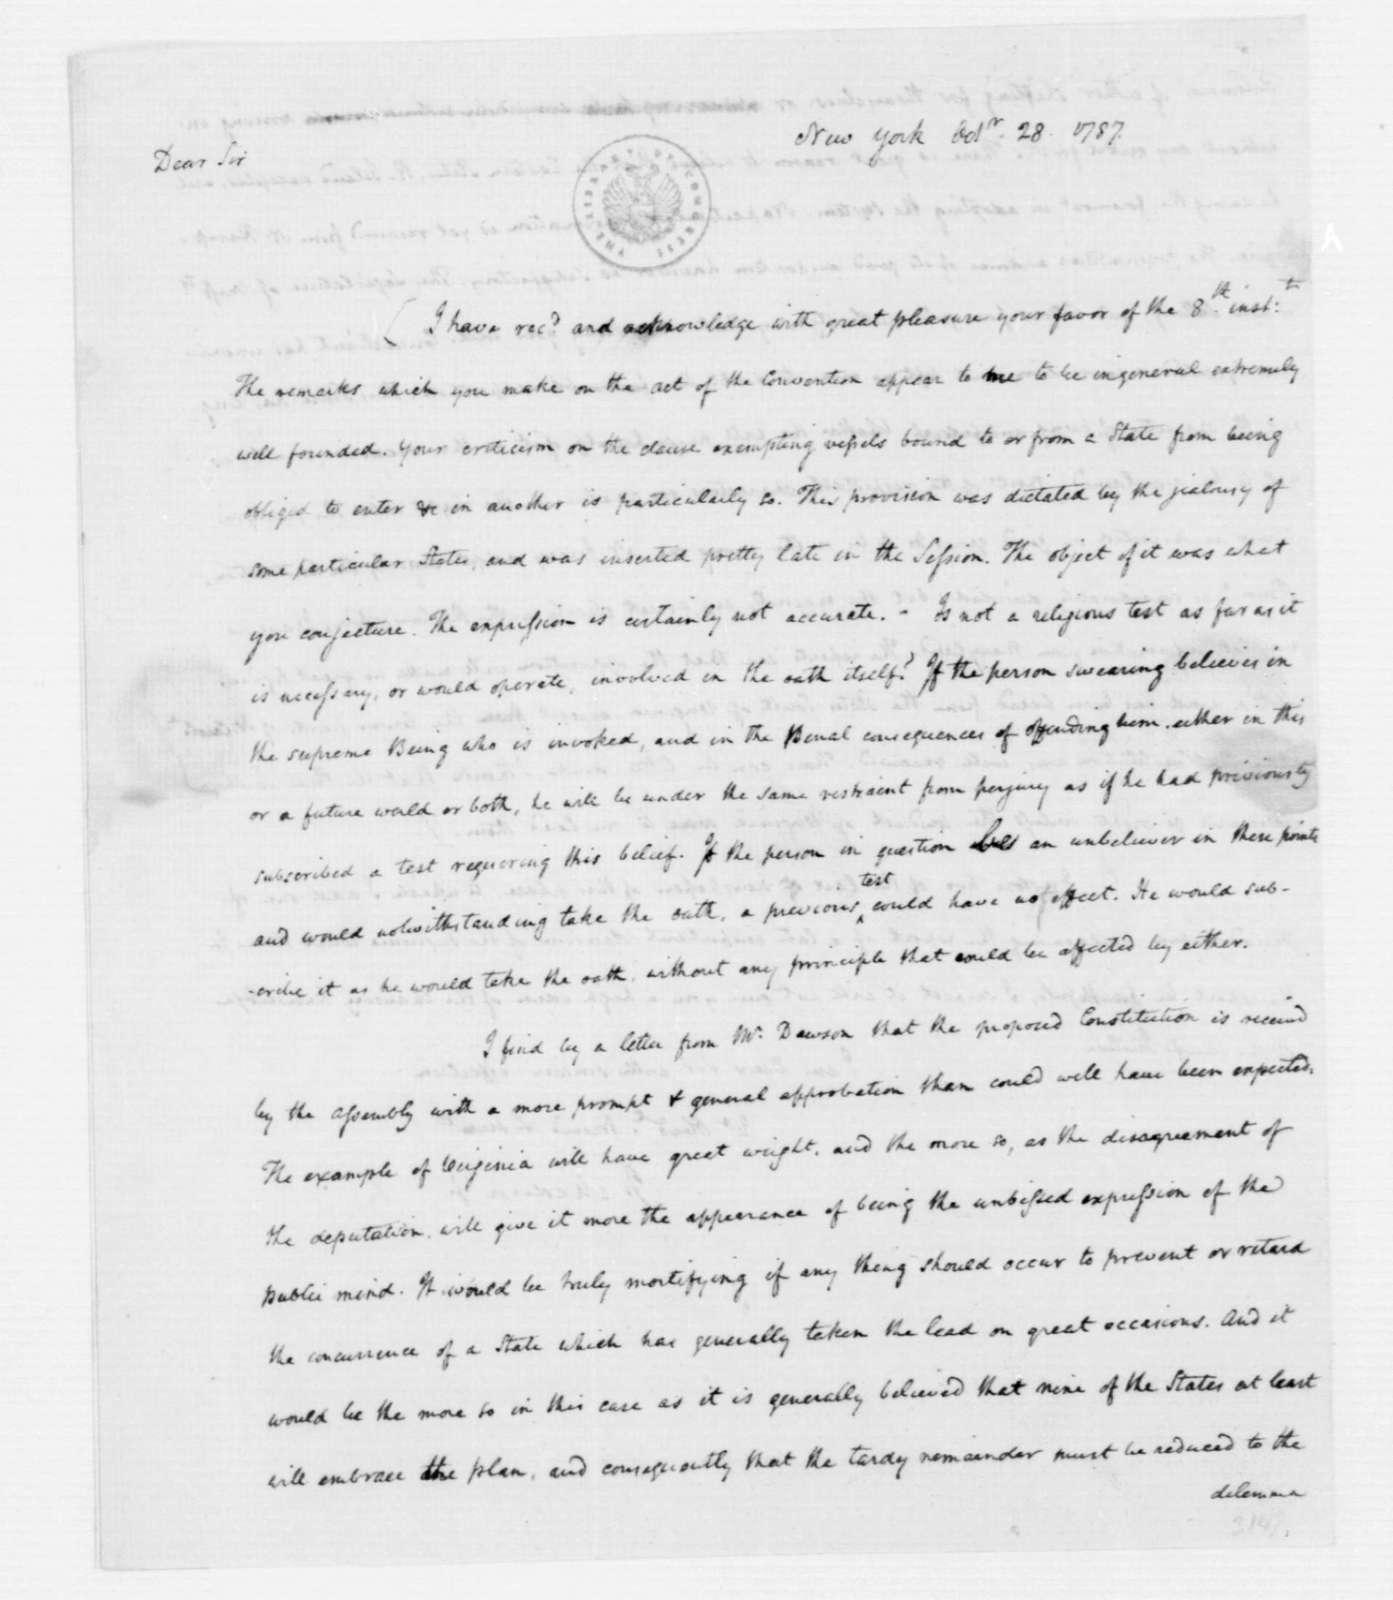 James Madison to Edmund Pendleton, October 28, 1787.